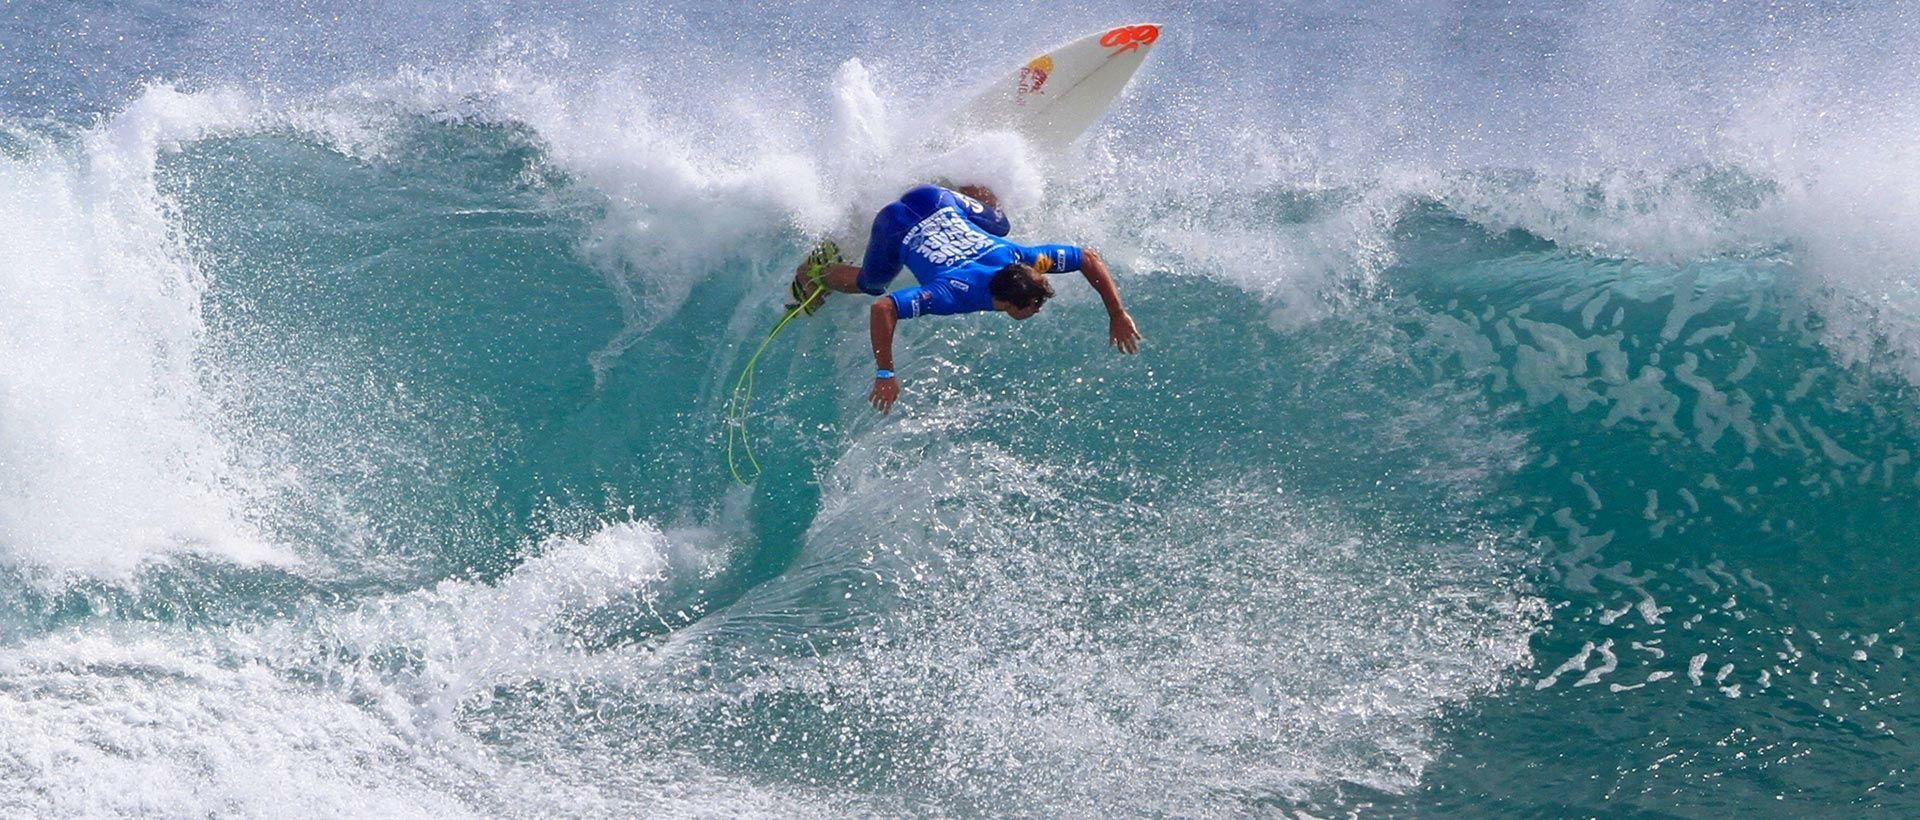 Camping 'Kiwi Surf Festival' in Biscarrosse